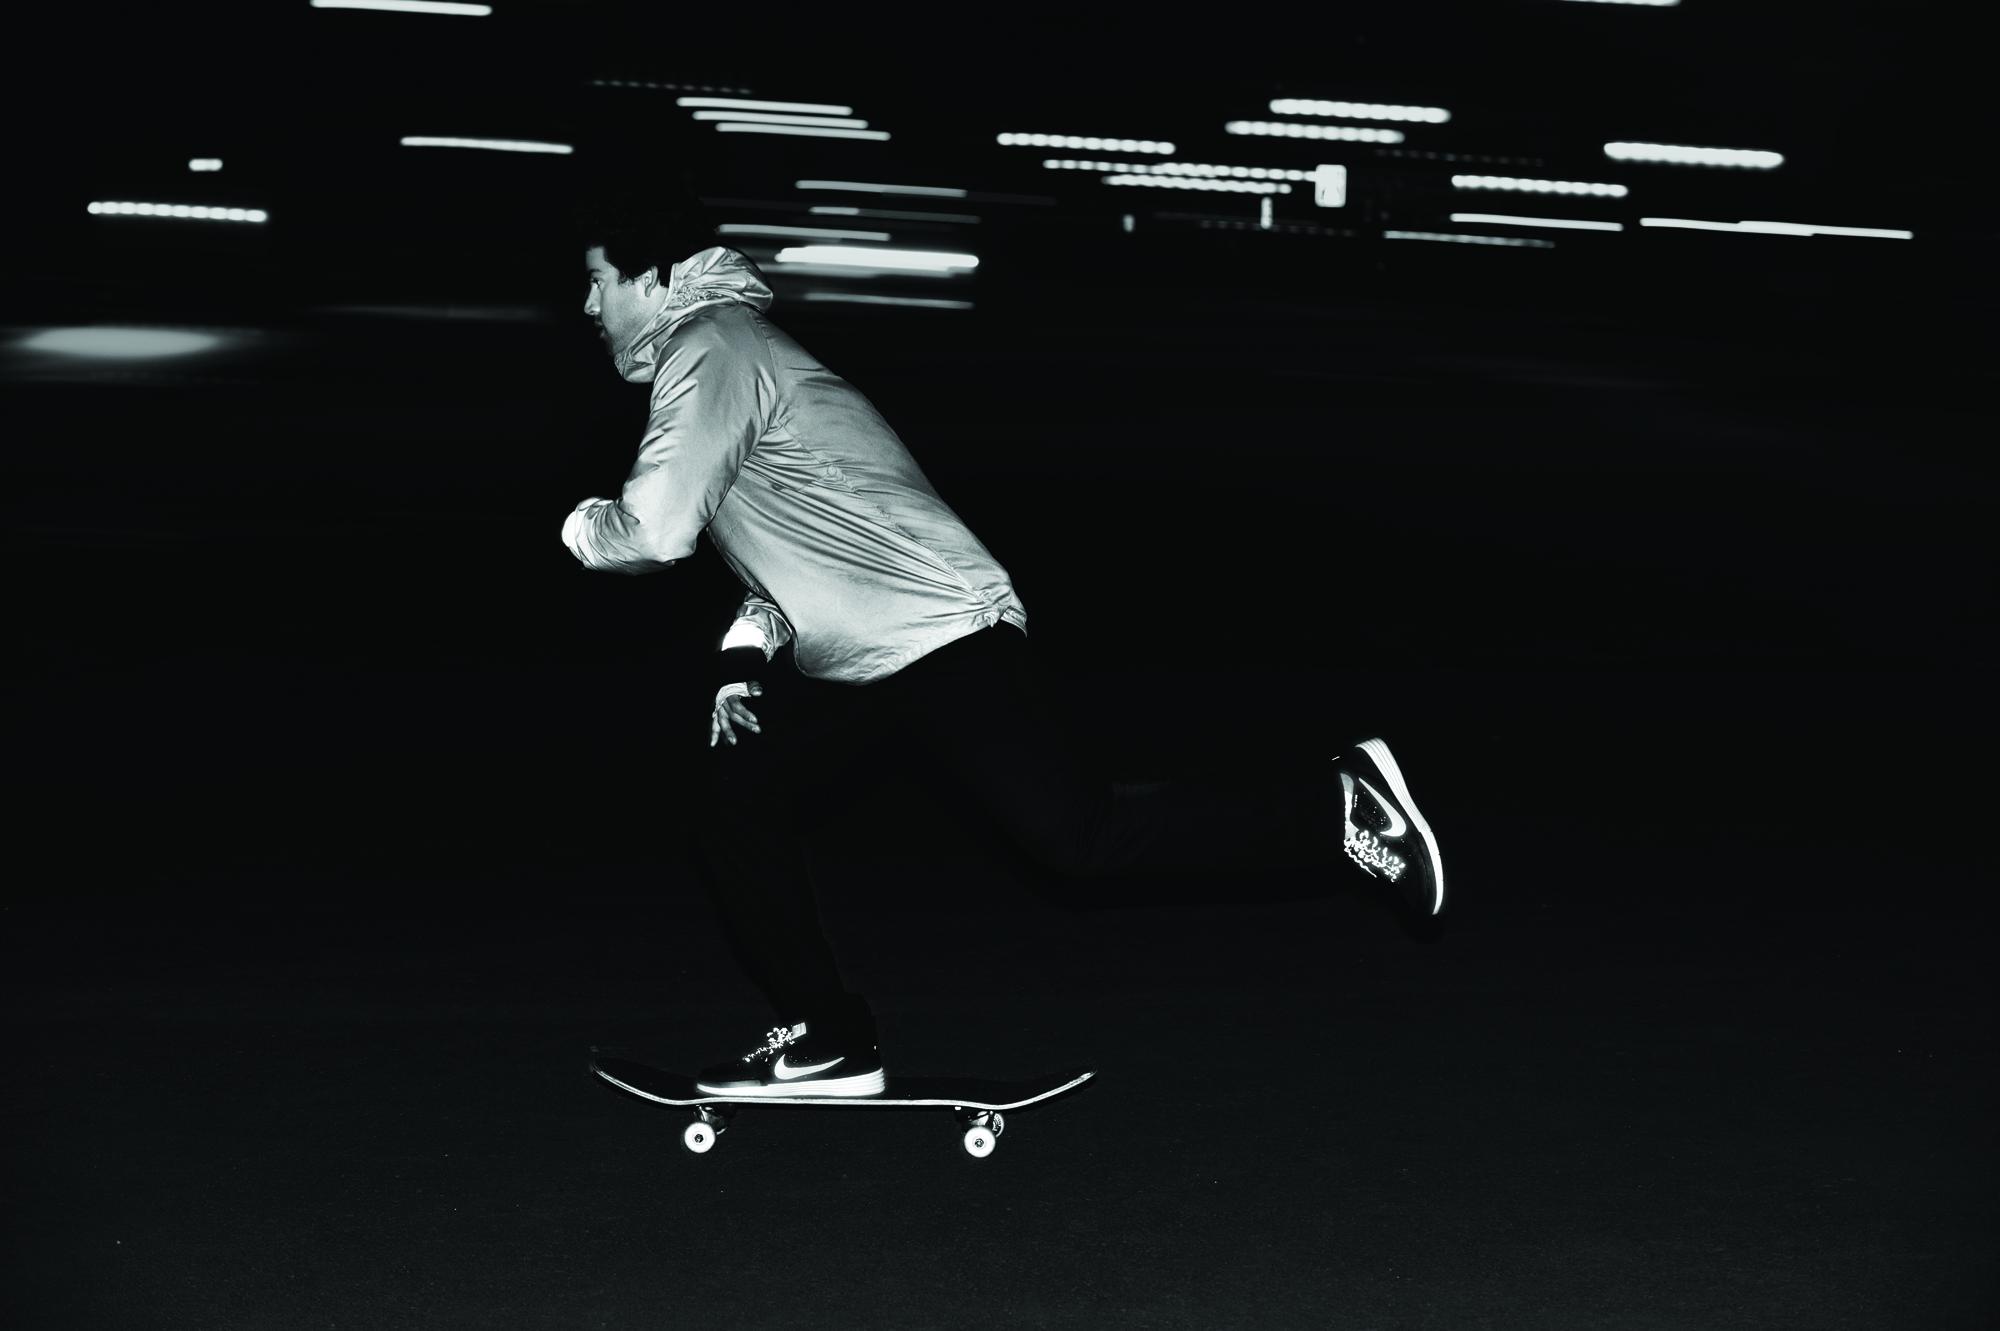 Nike_SB_HO14_FlashPack_Athlete_Secondary_A_33370